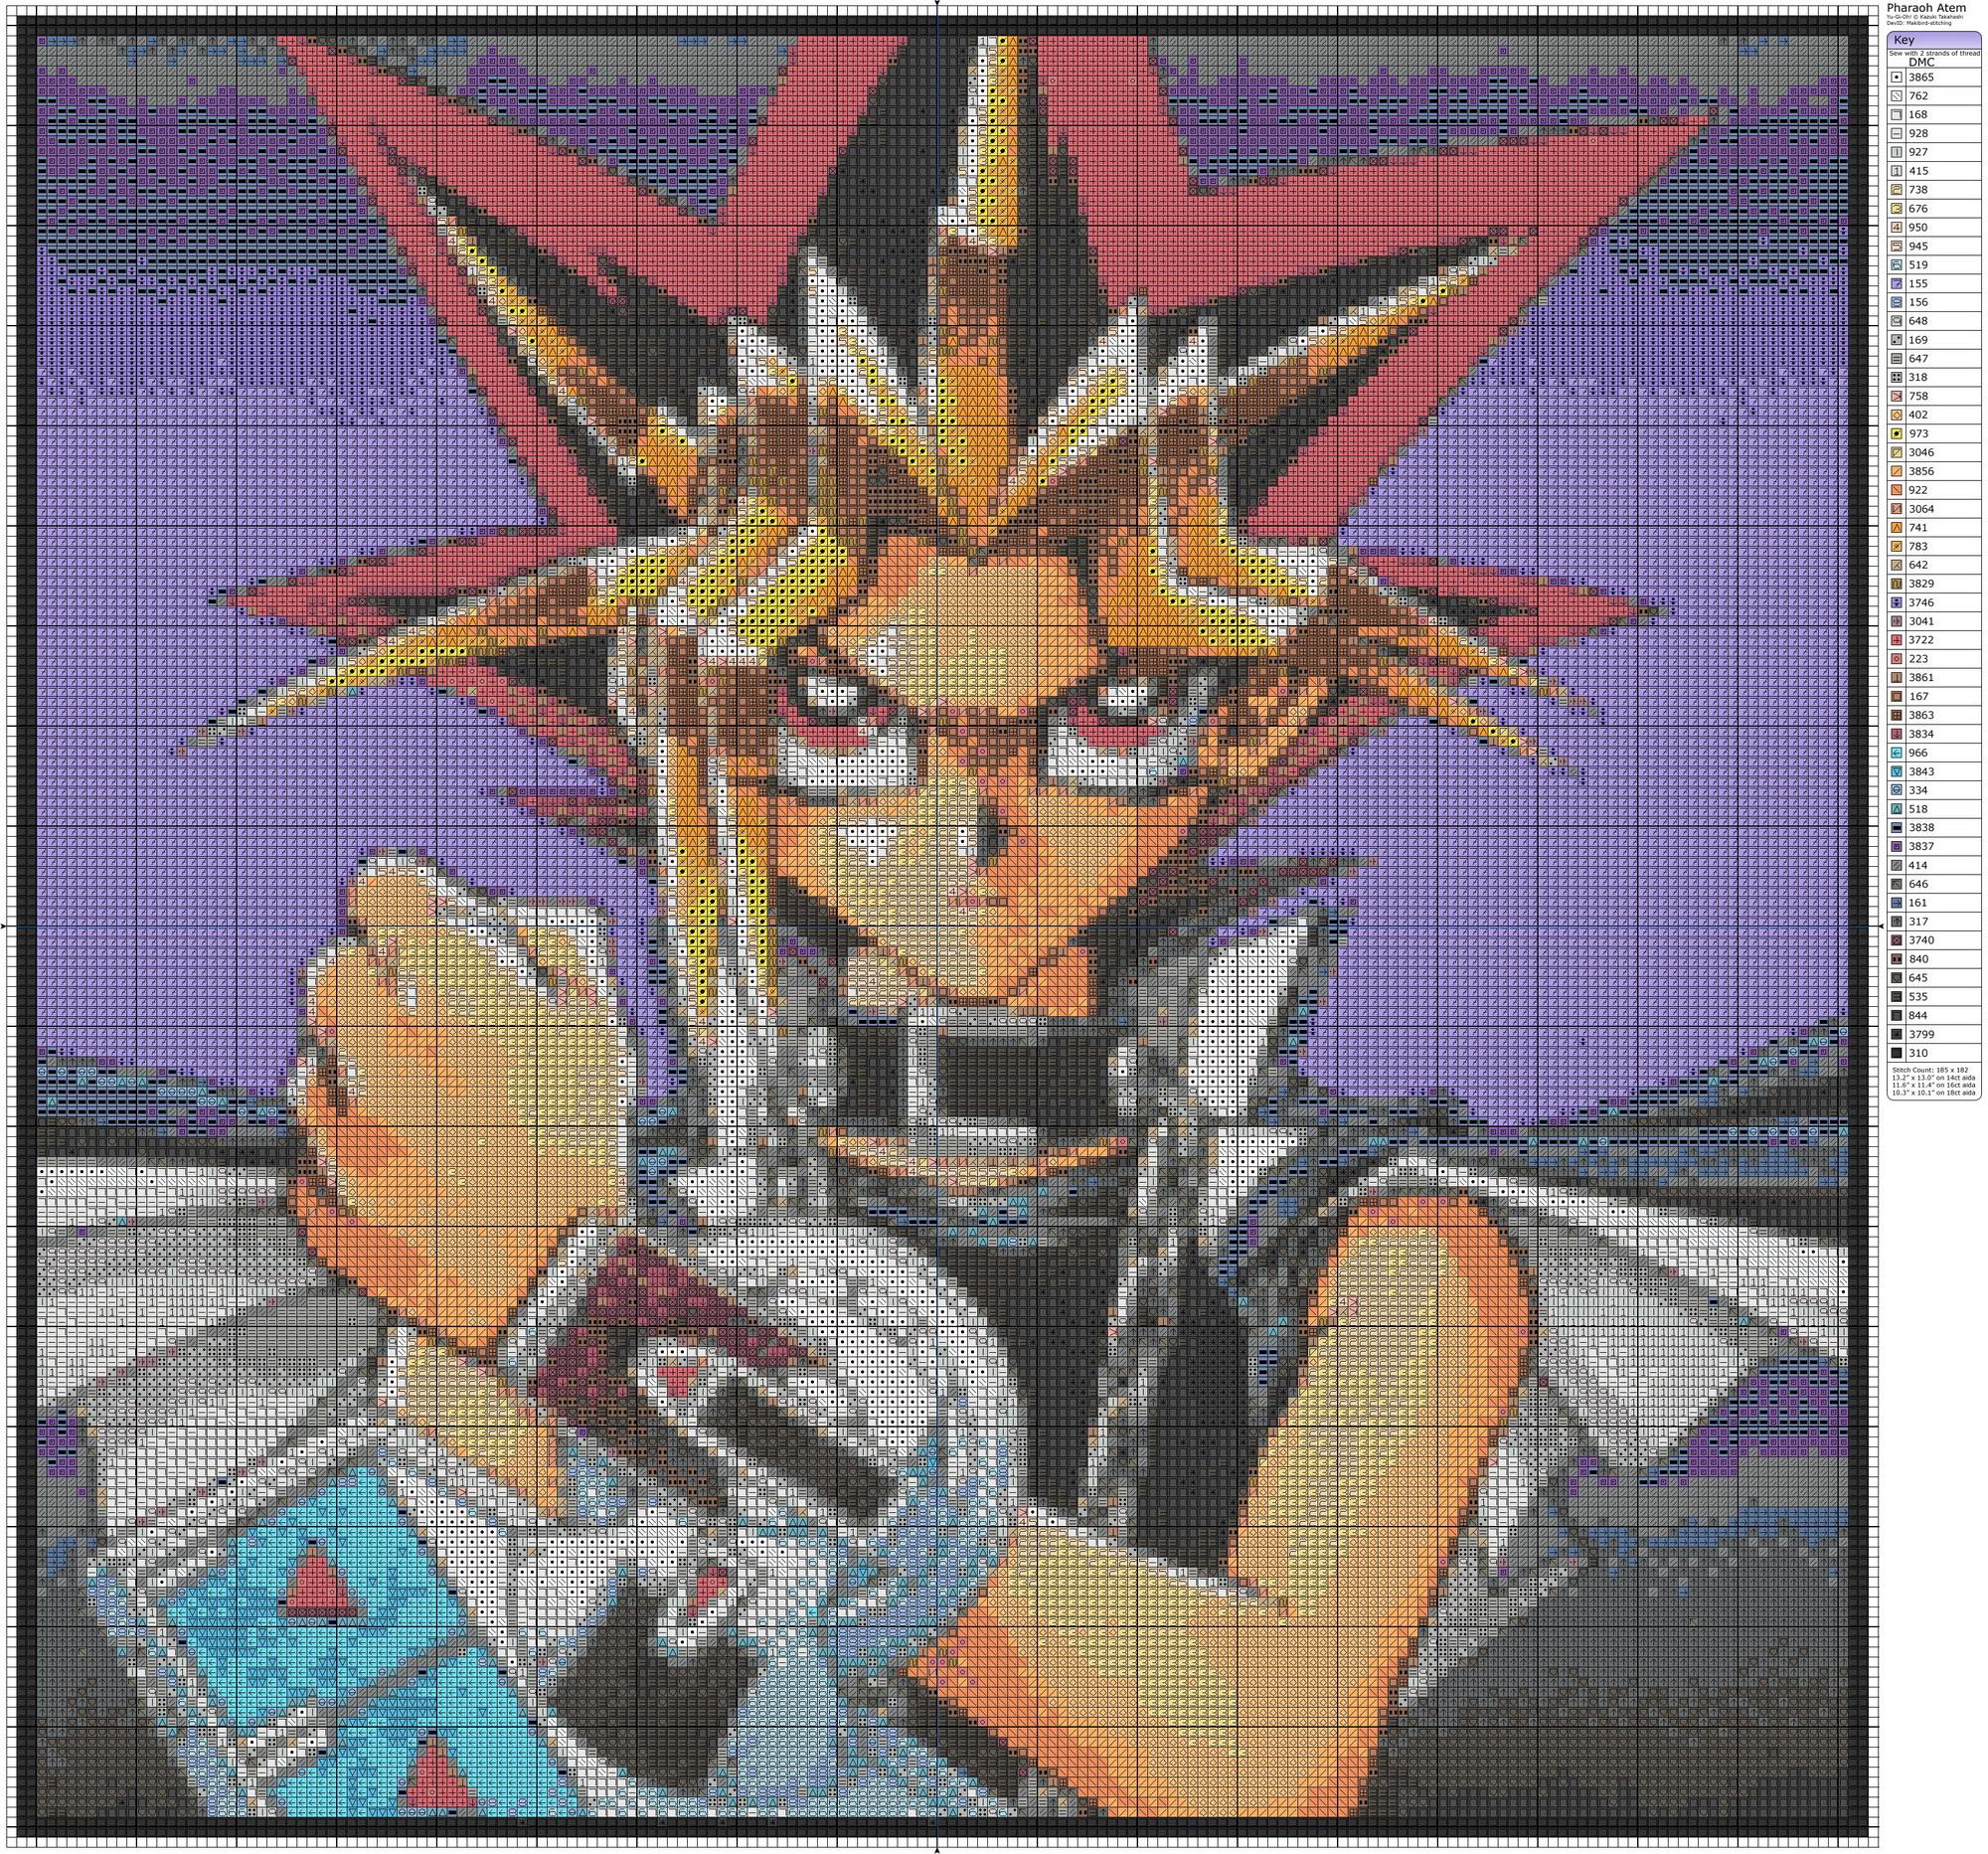 schemi_misti/cartoni_animati03/anime-manga-17.jpg